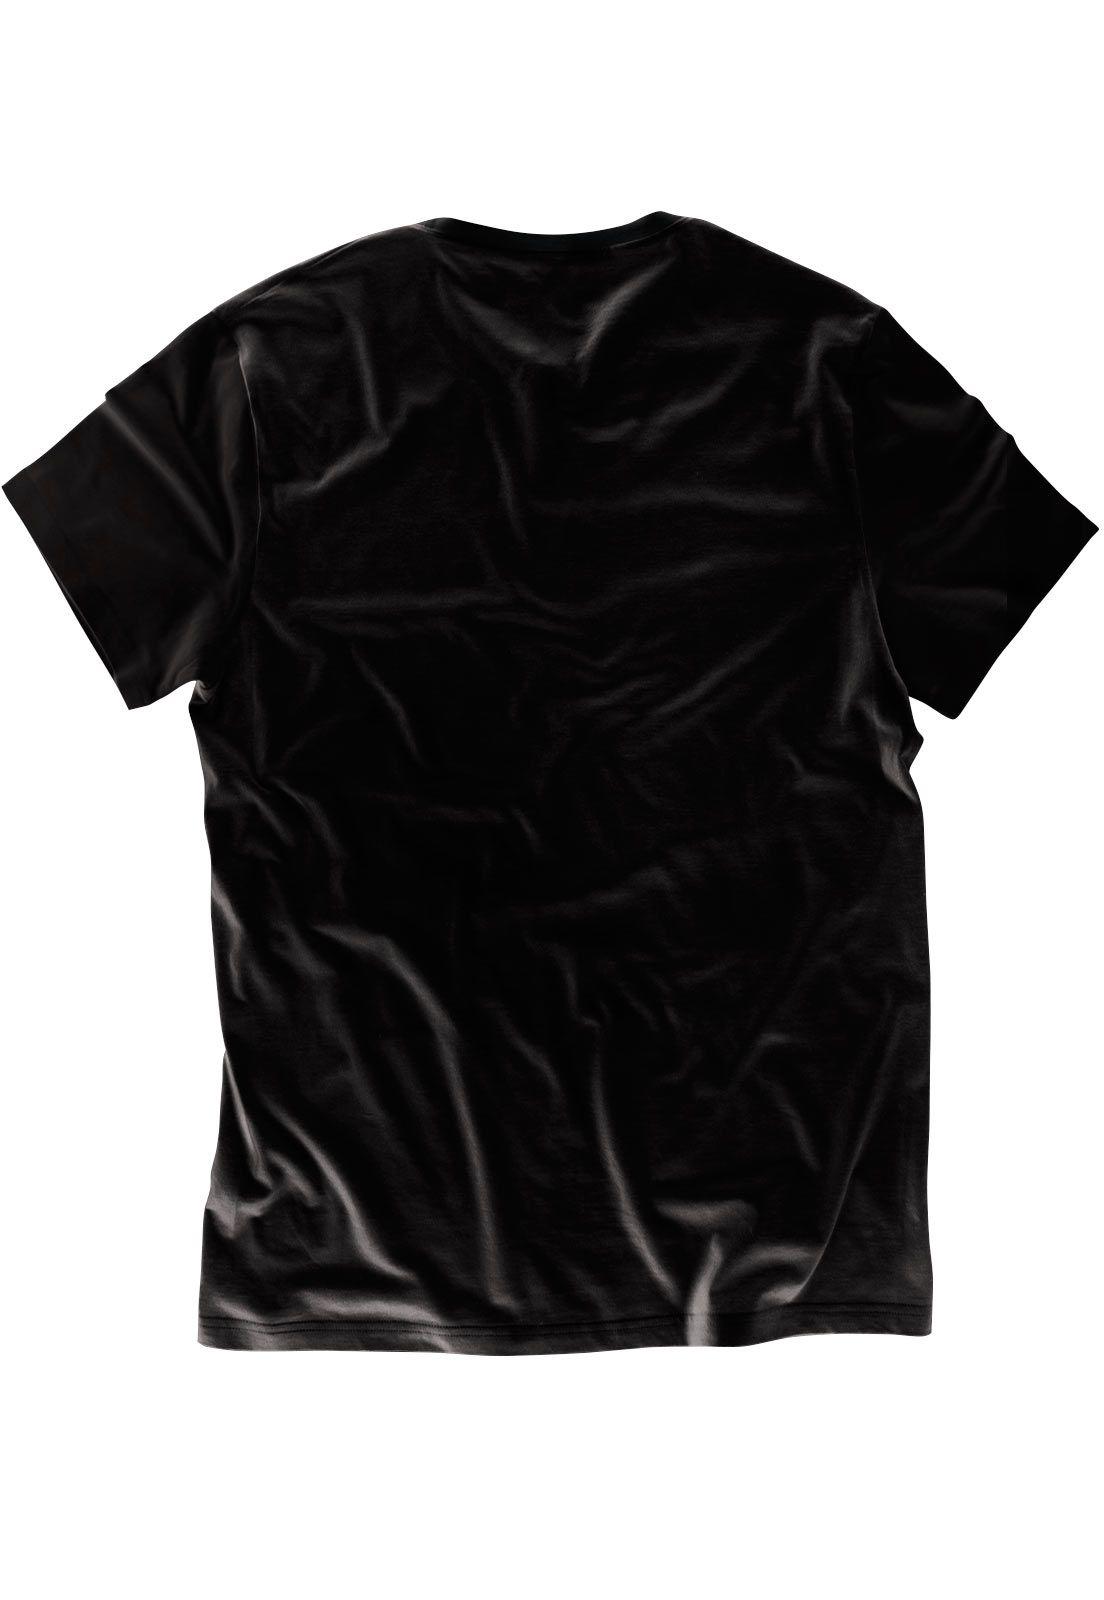 Camiseta ElephunK Estampada Liberté, Egalité, Fraternité Preta